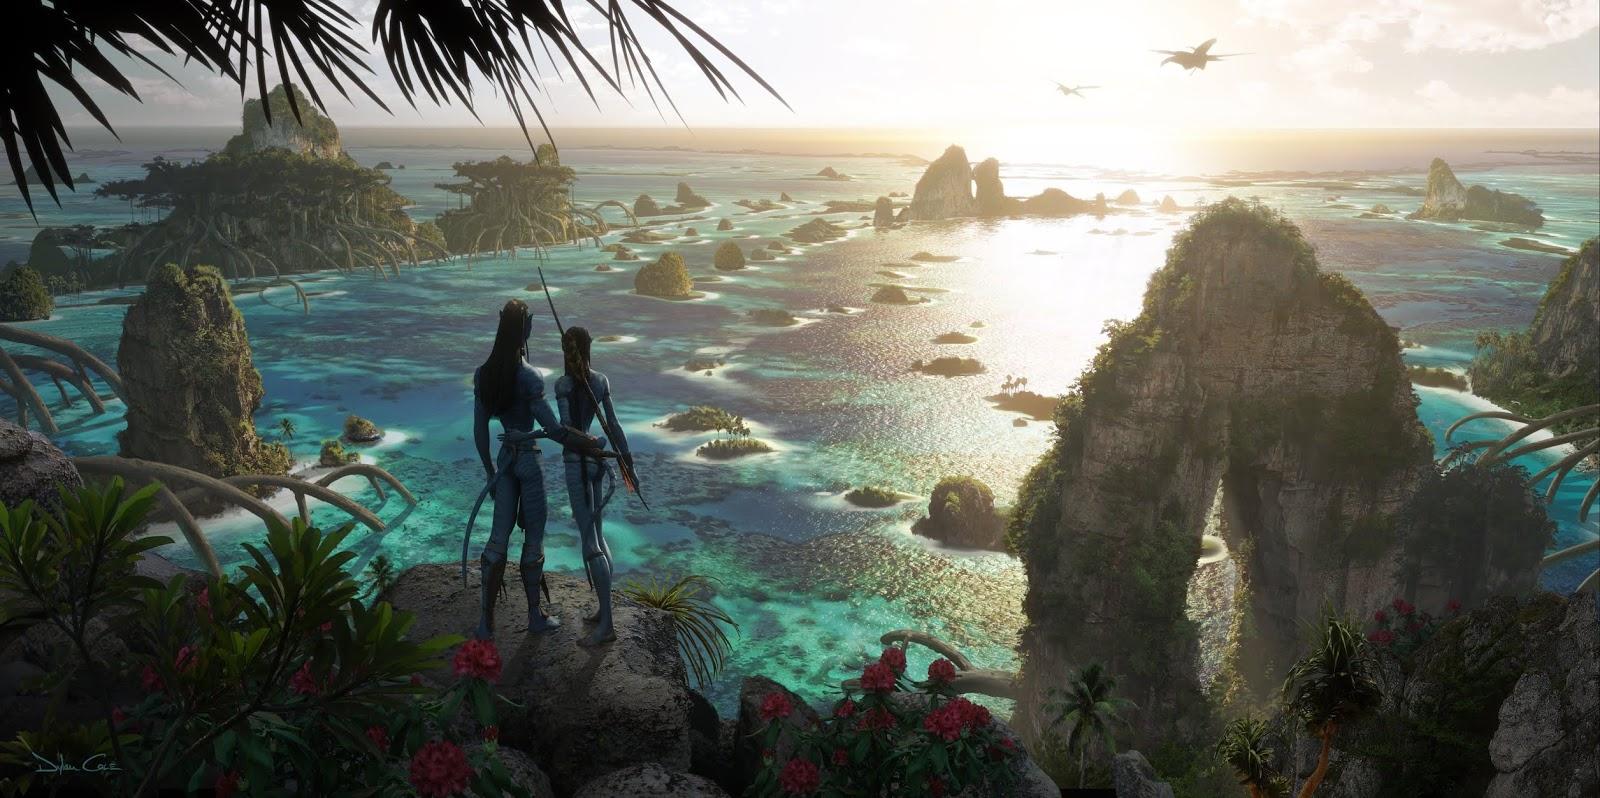 Coronavirus: Matrix 4 and Avatar 2 suspend filming